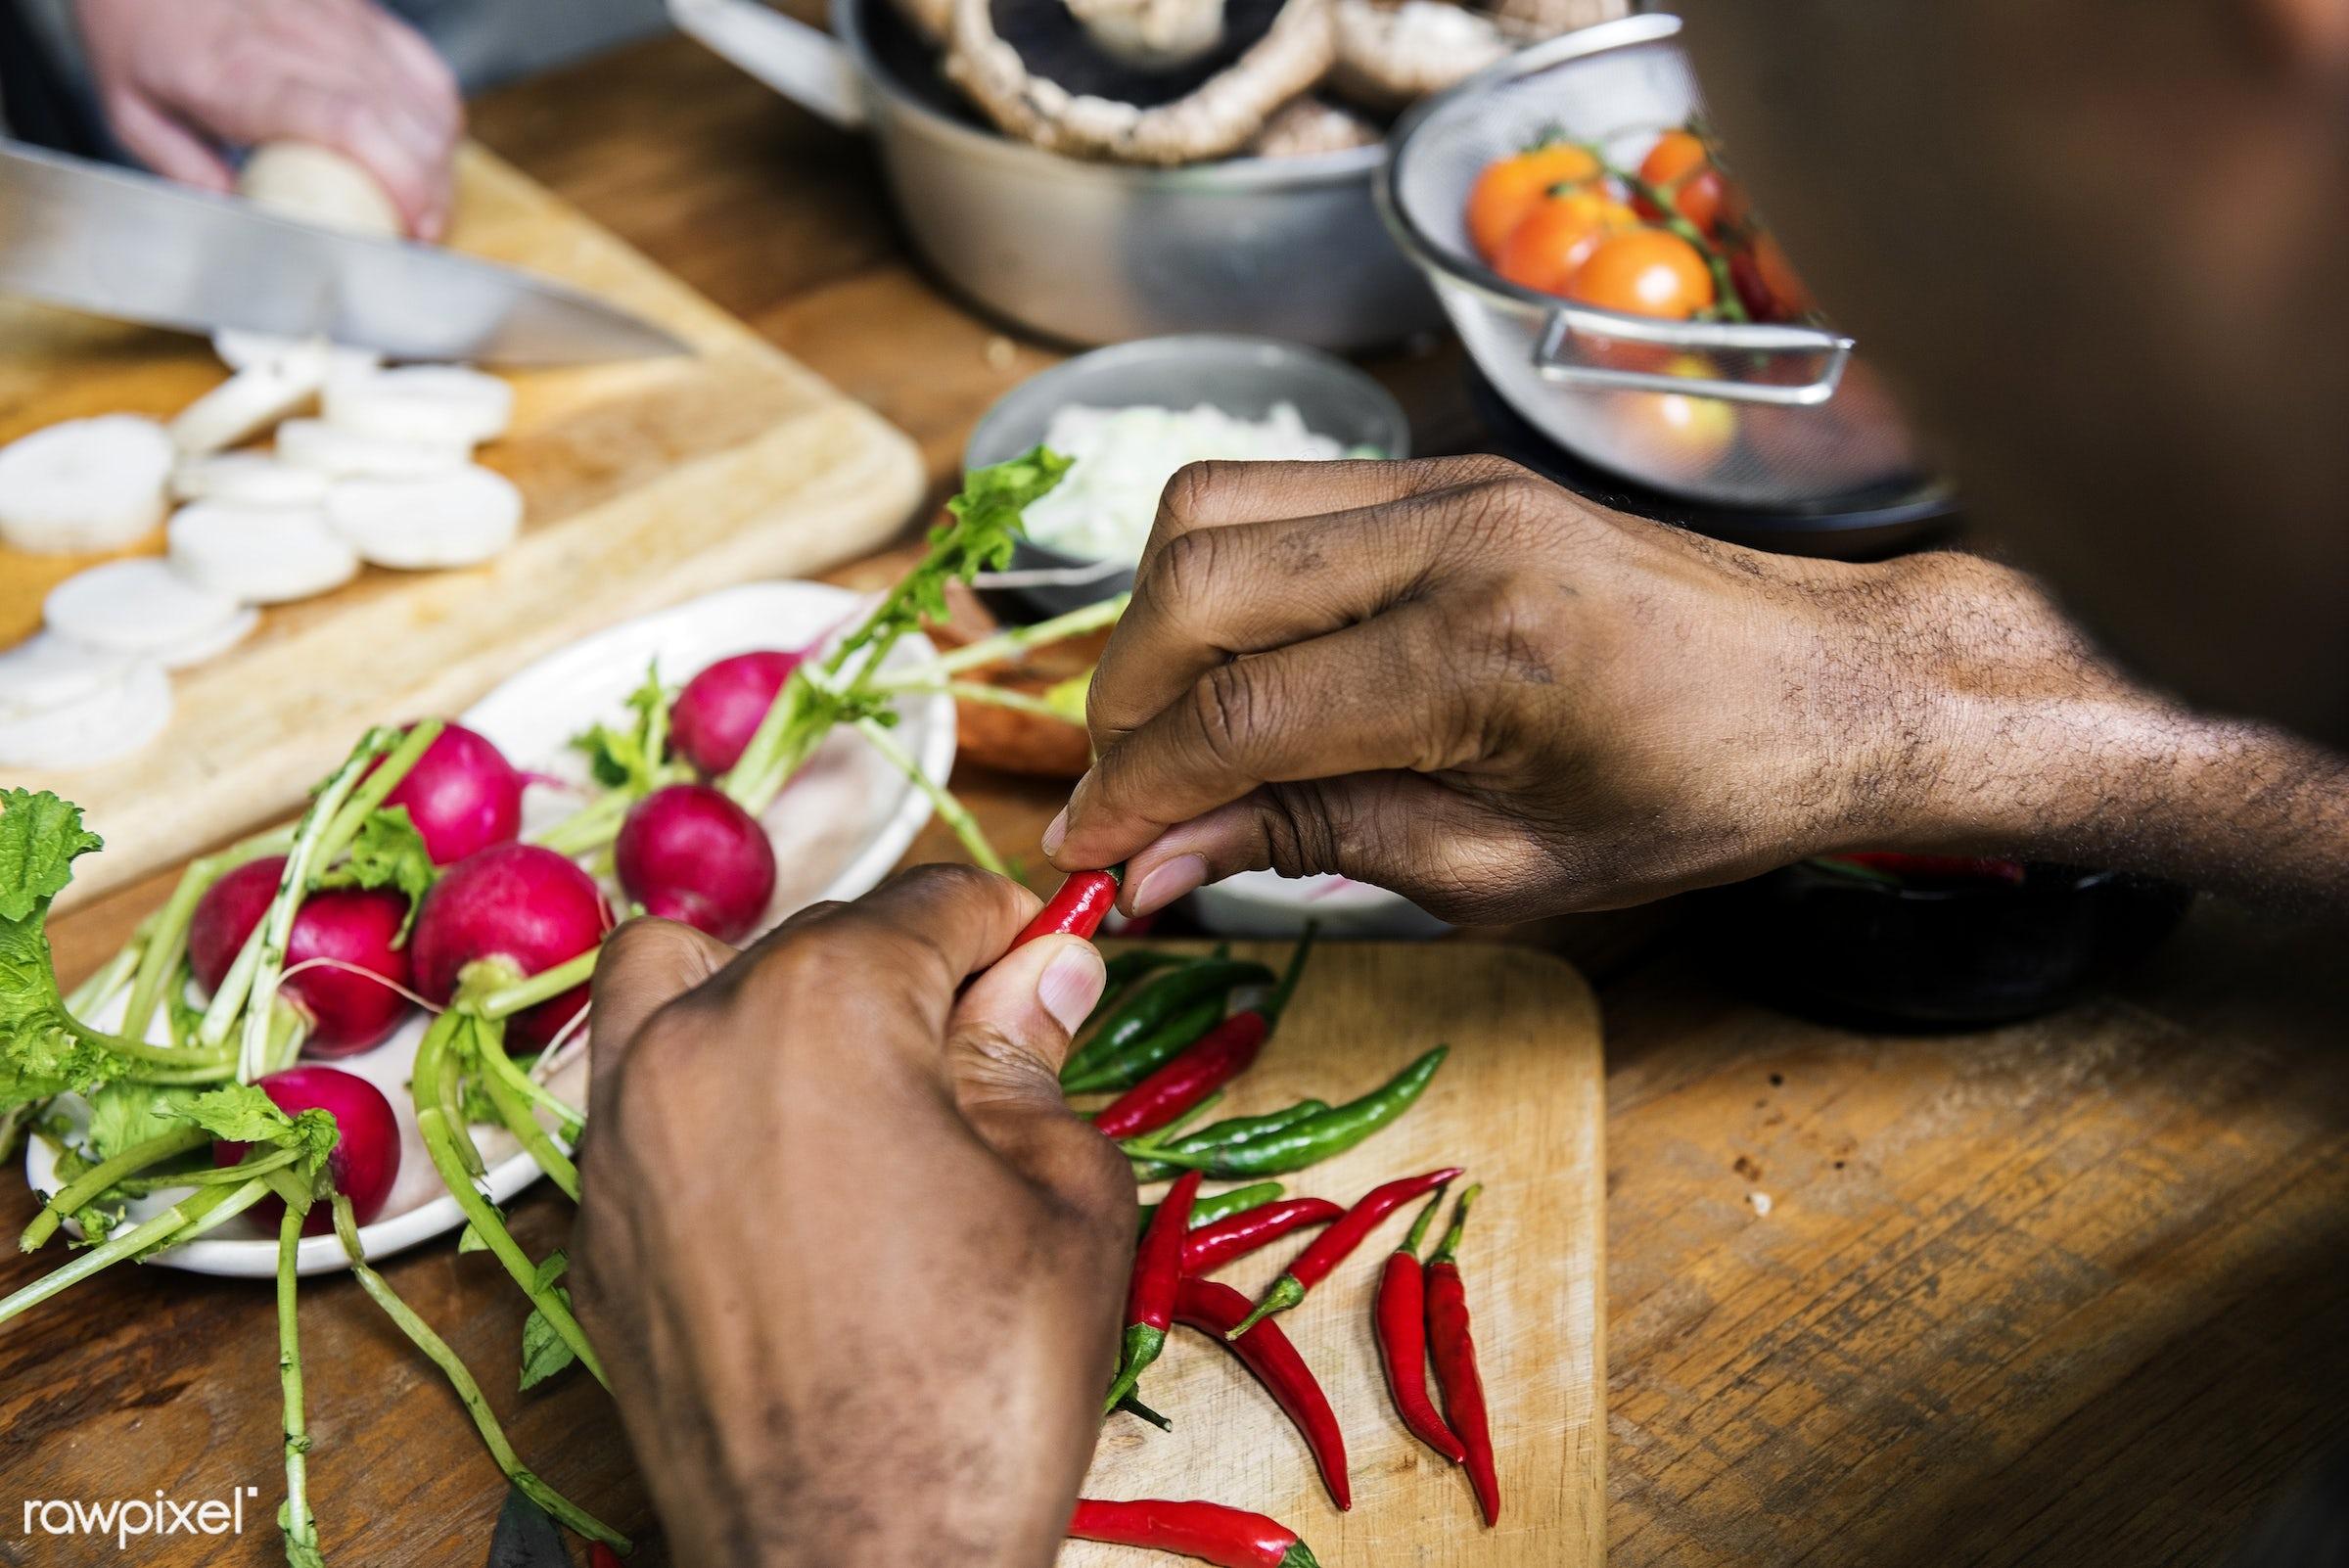 raw, diverse, chopping board, pepper, ingredients, farm, nature, farmer, hands, fresh, products, closeup, cut board,...